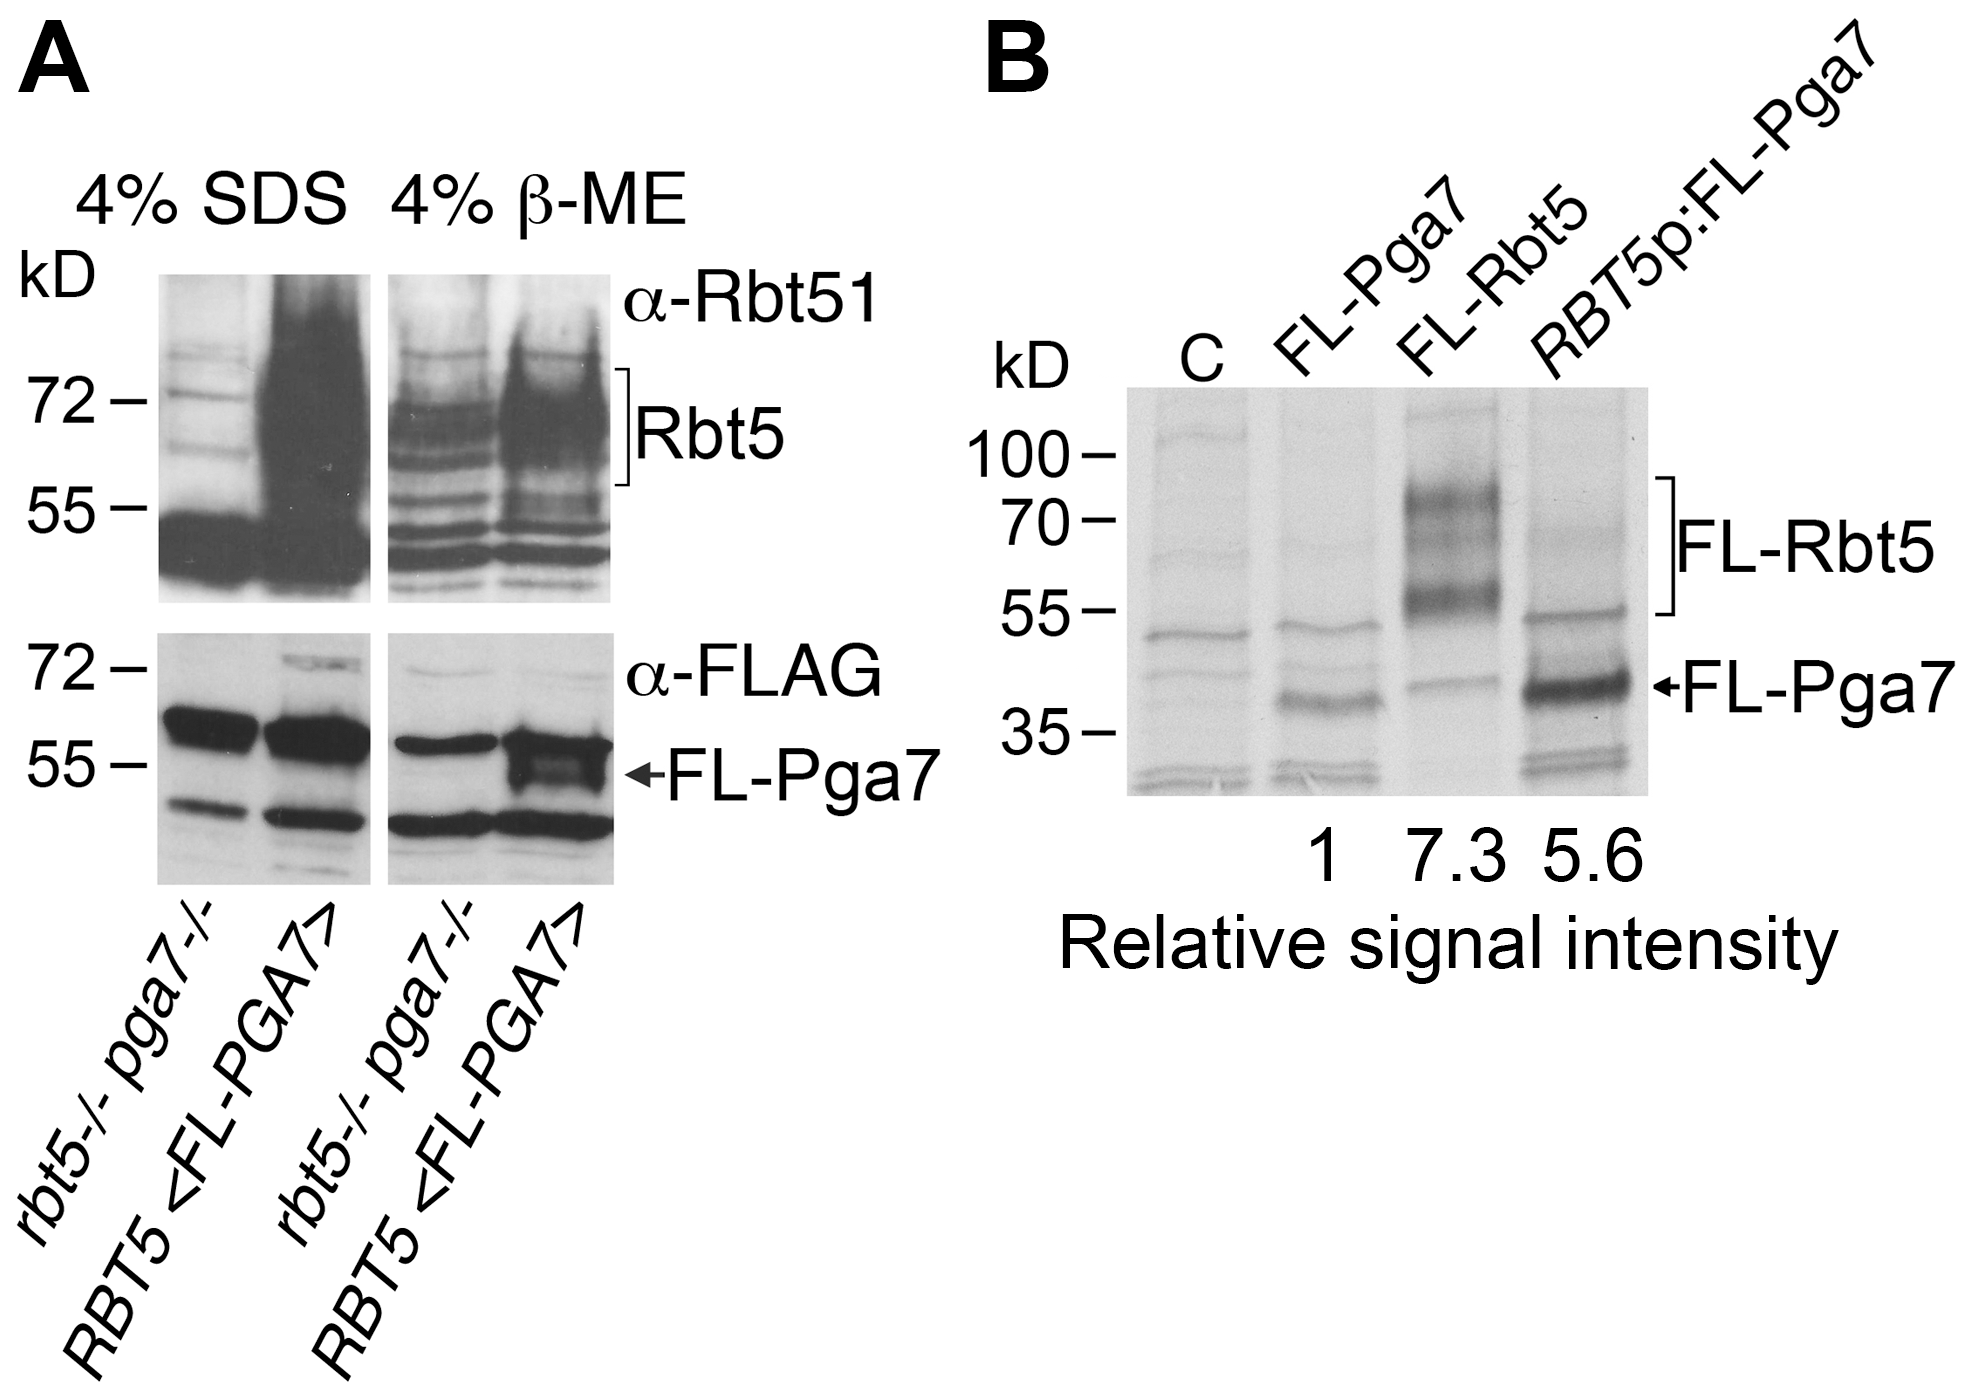 Rbt5 is more abundantly expressed than Pga7.